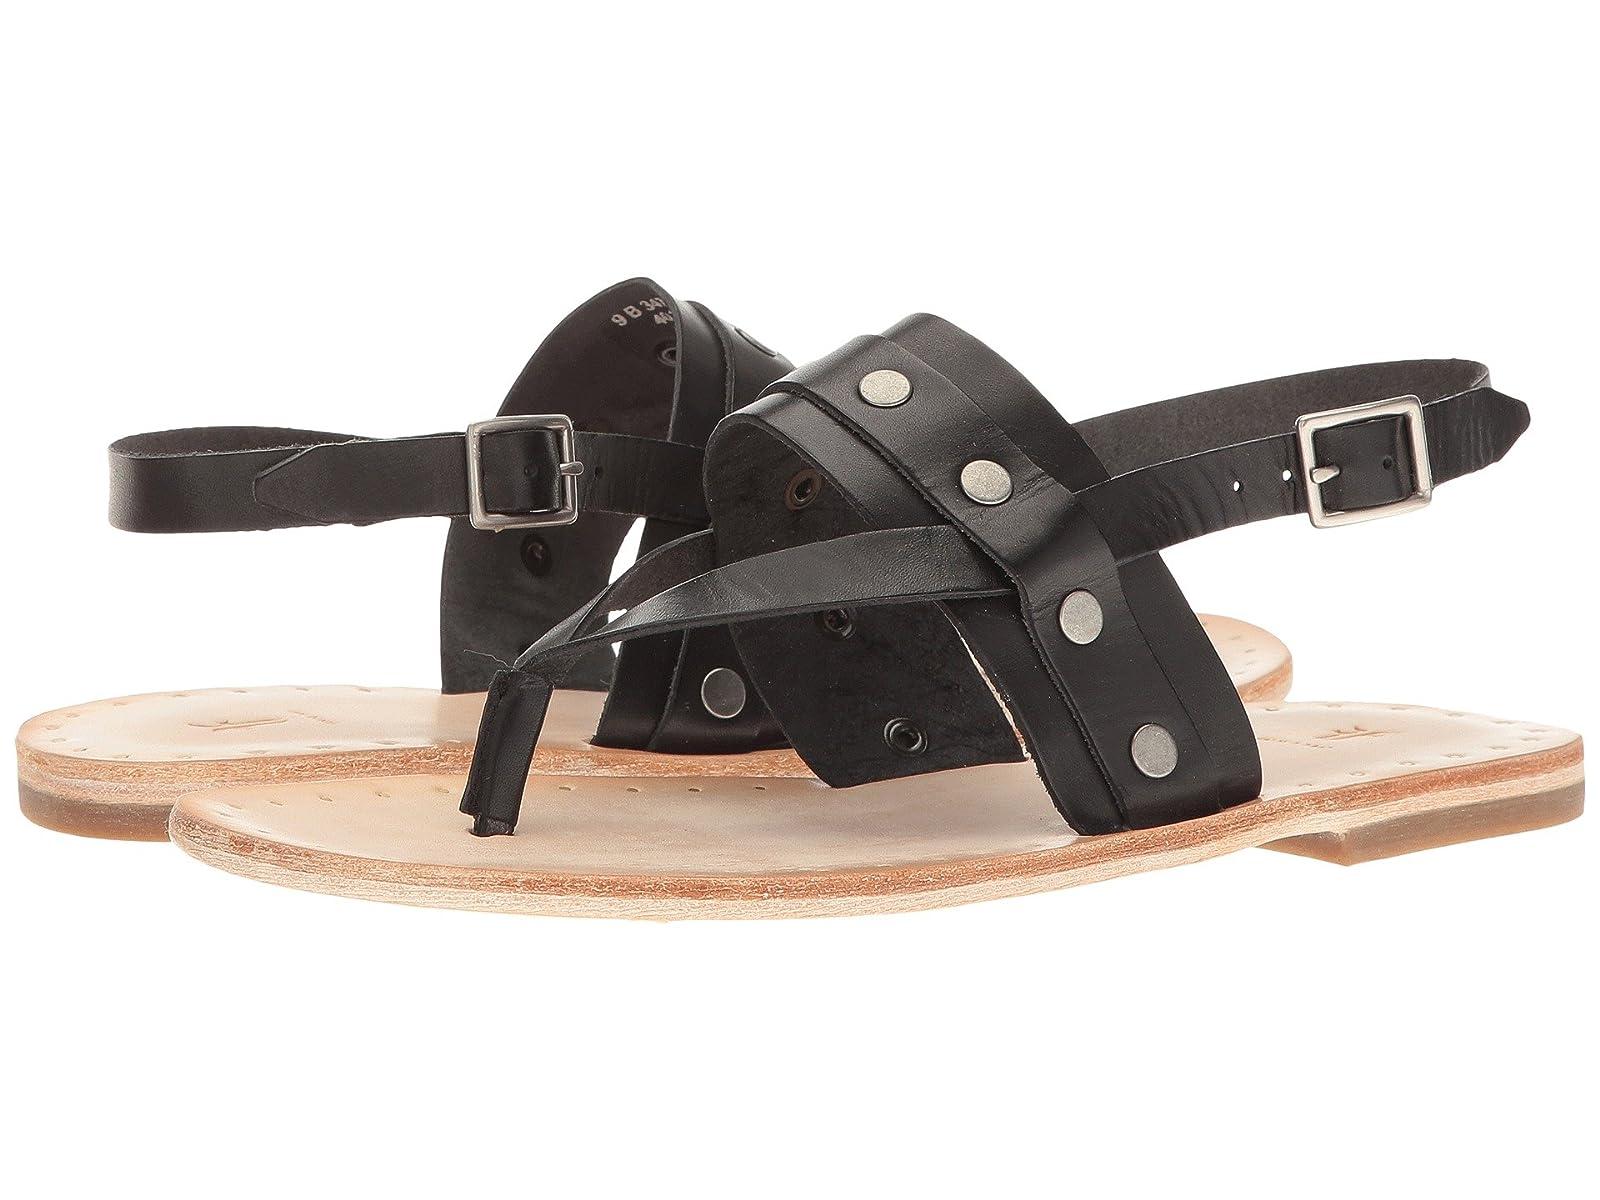 Frye Avery Stud ThongCheap and distinctive eye-catching shoes